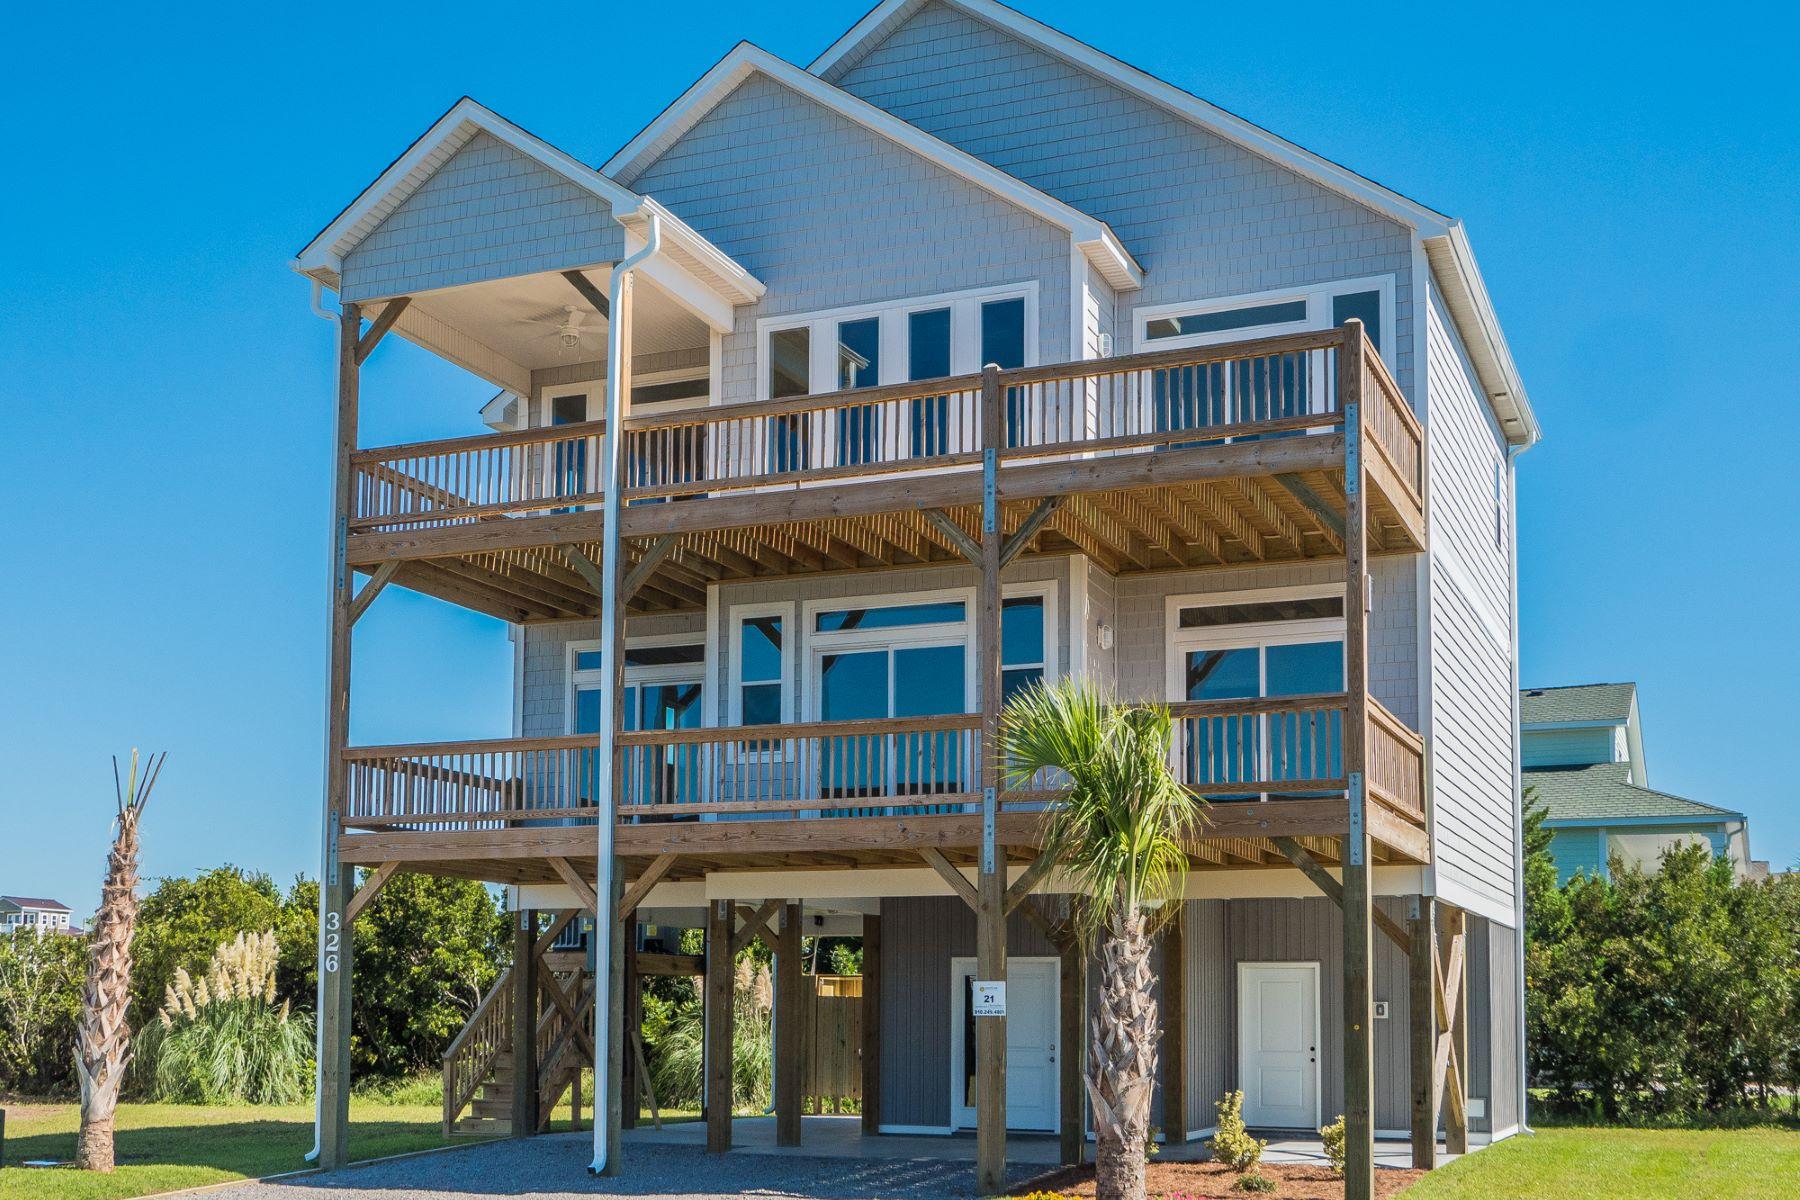 واحد منزل الأسرة للـ Sale في Exceptional Newly Constructed Waterfront Home 316 Oceanaire Ln, Surf City, North Carolina, 28445 United States